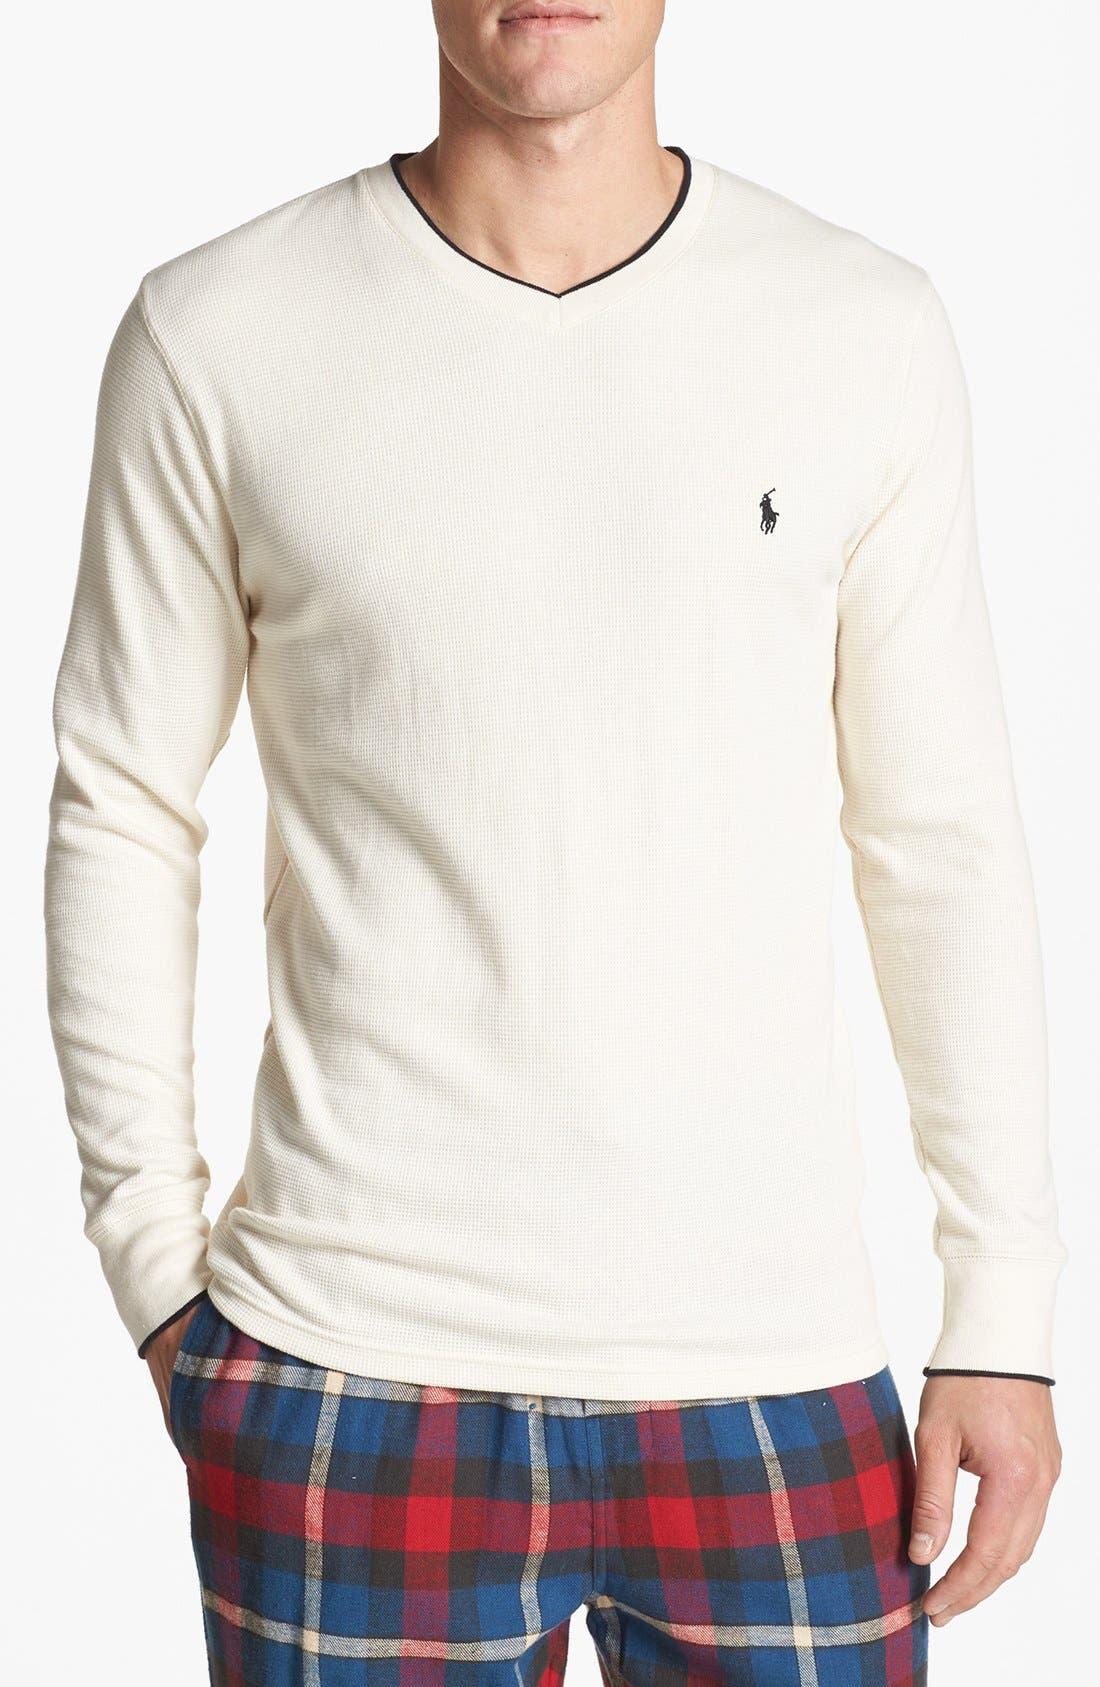 Alternate Image 1 Selected - Polo Ralph Lauren Waffle Knit Lounge Shirt